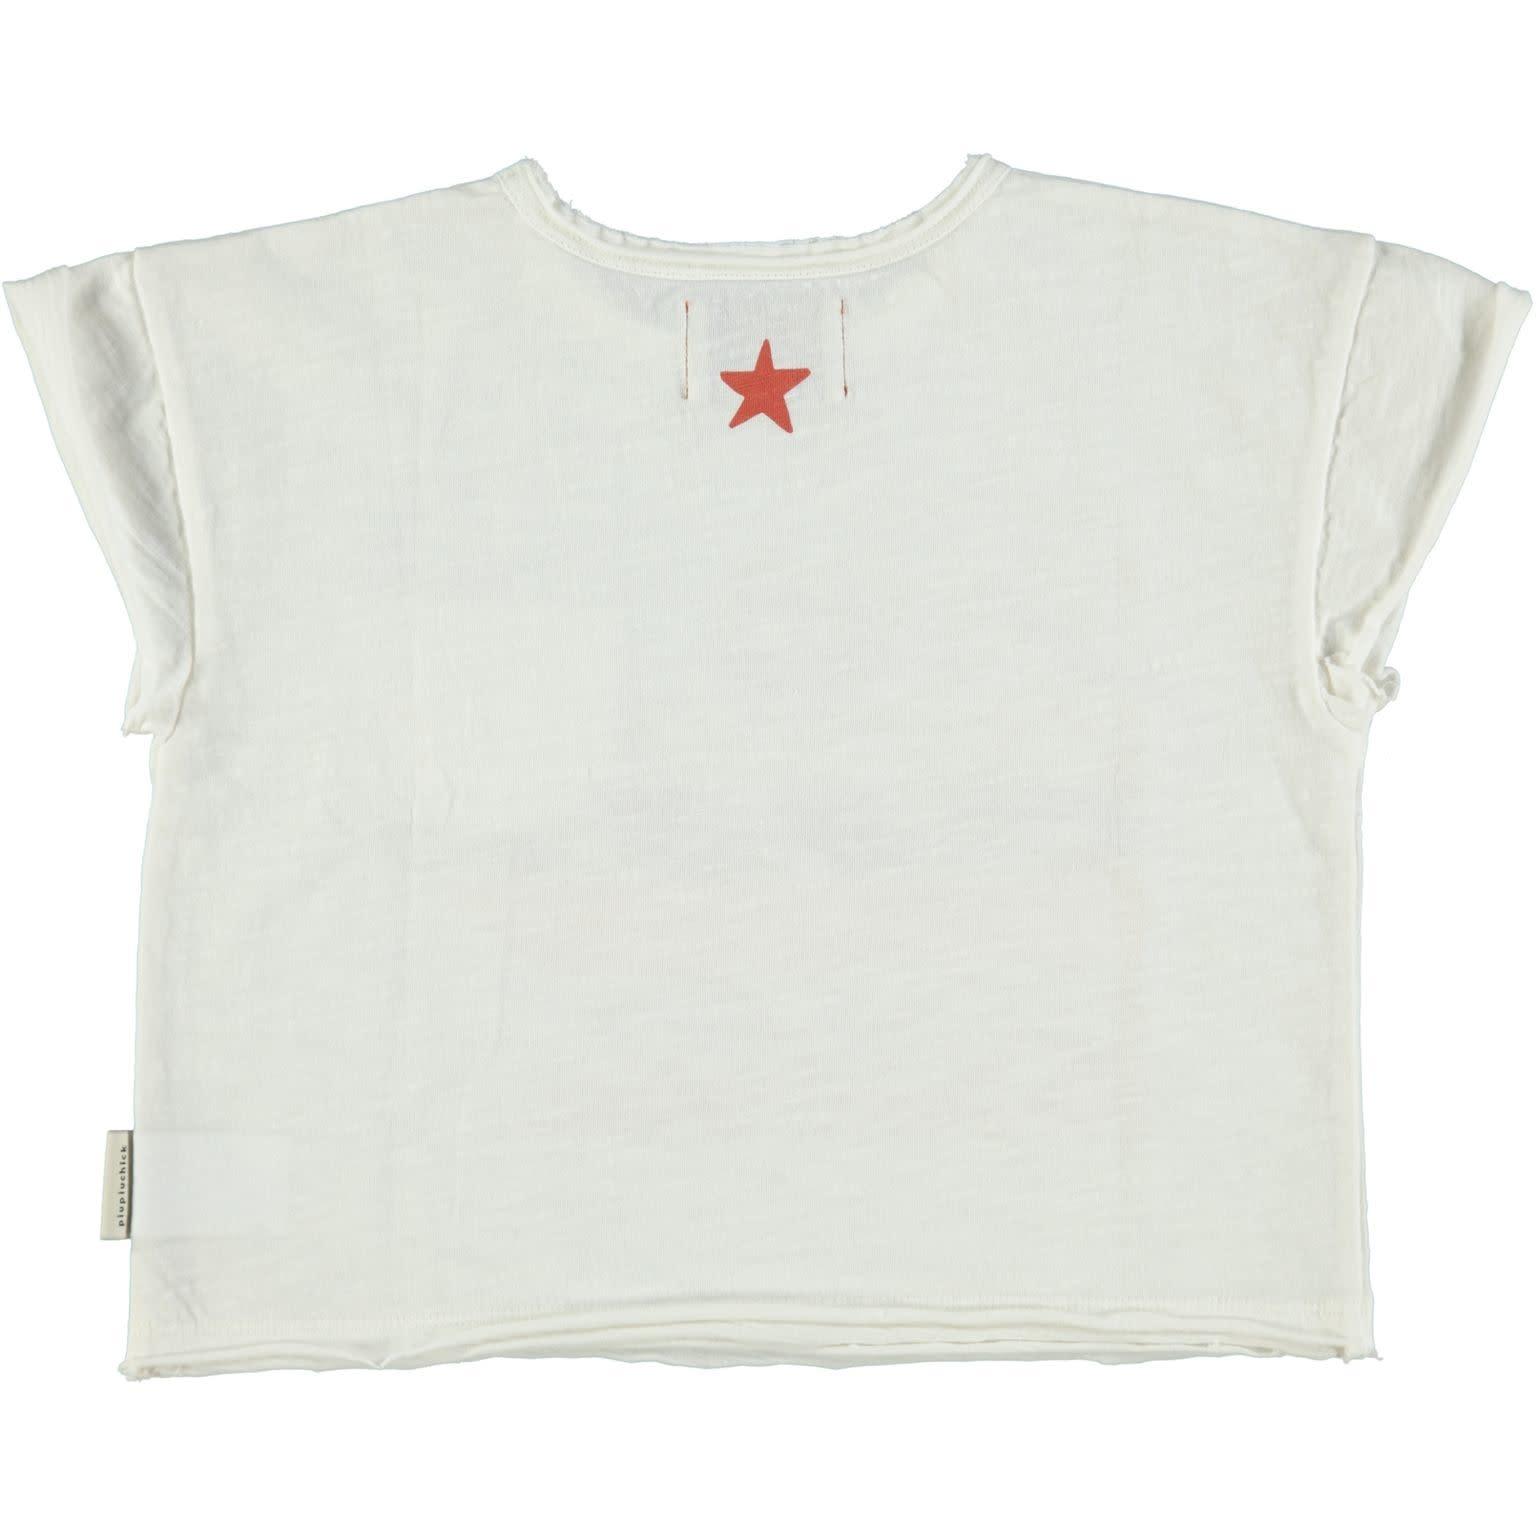 Piupiuchick Piupiuchick - T-shirt off white with print